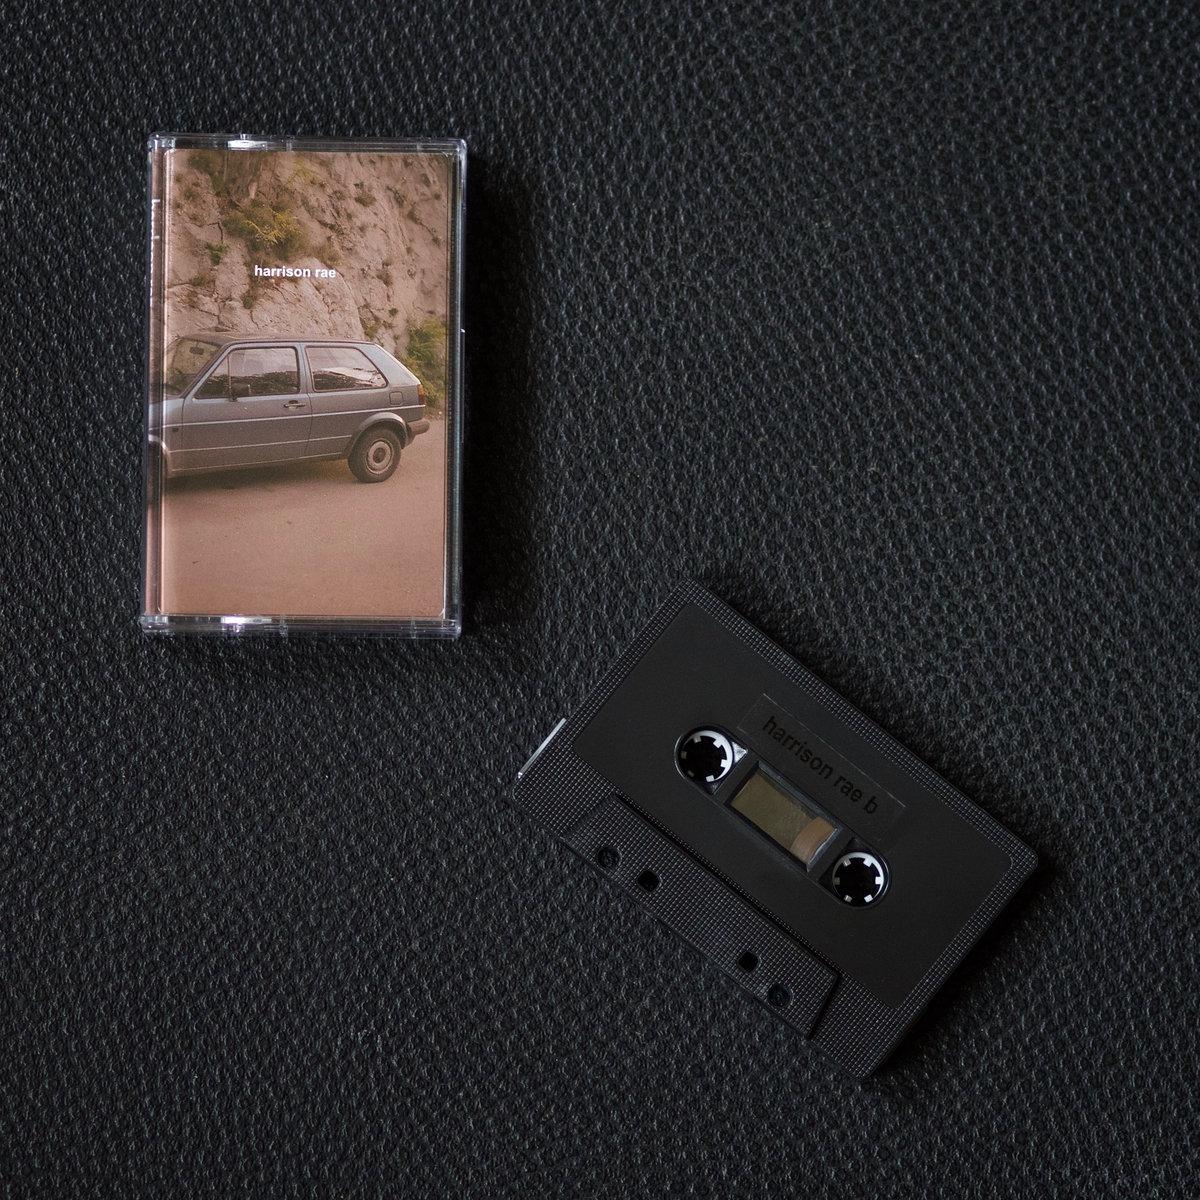 Harrison Rae - 'Untitled EP' [Club Moss 001]